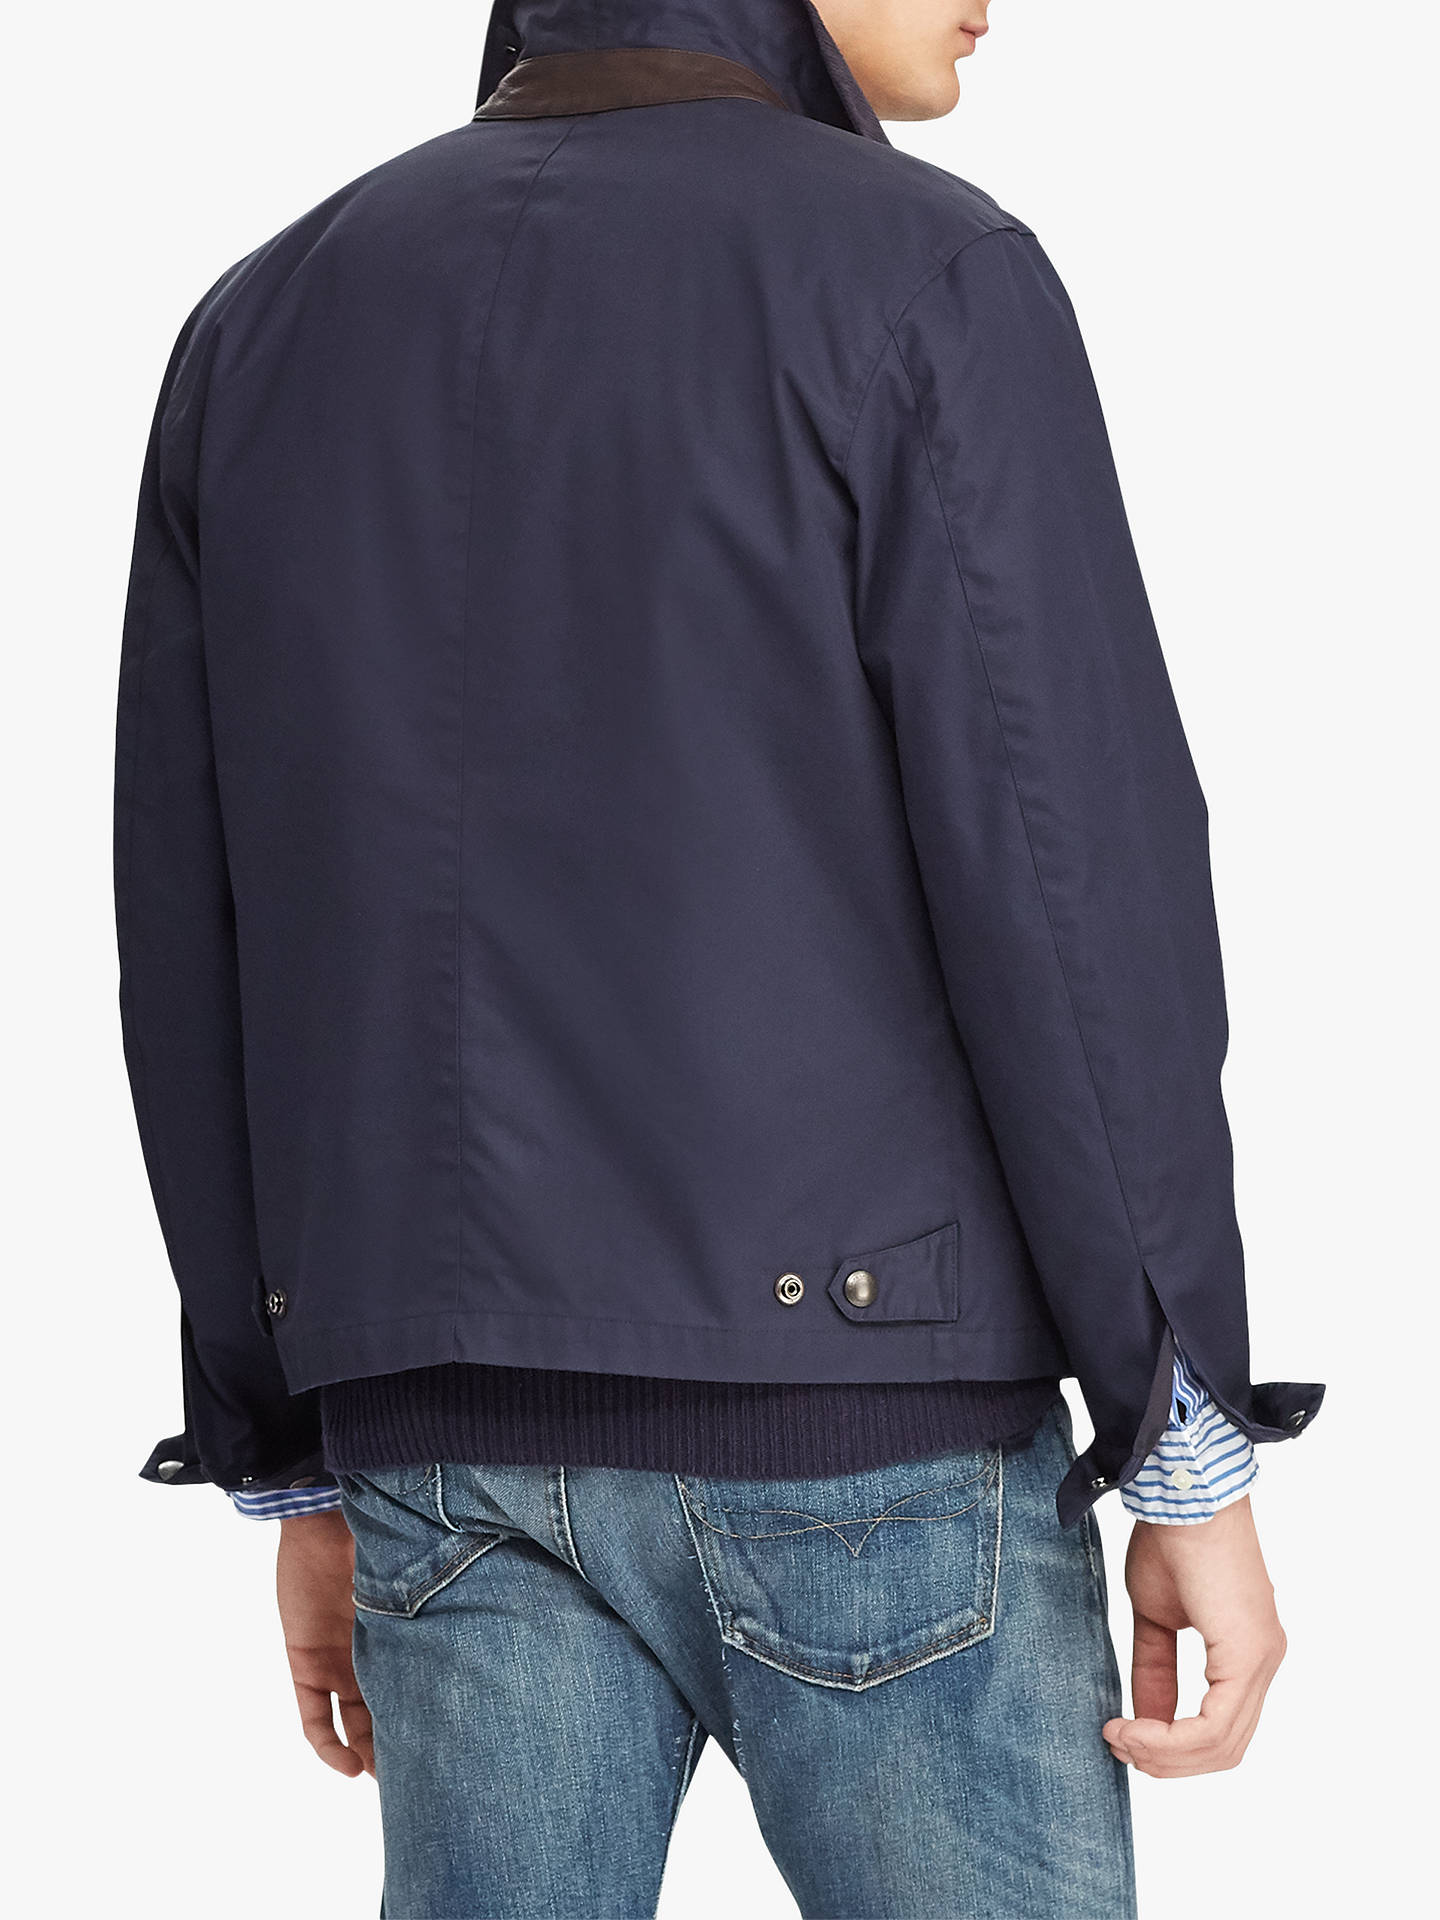 Navy Ralph Lauren Collar Twill Polo Corduroy JacketAviator fg7Ybyv6